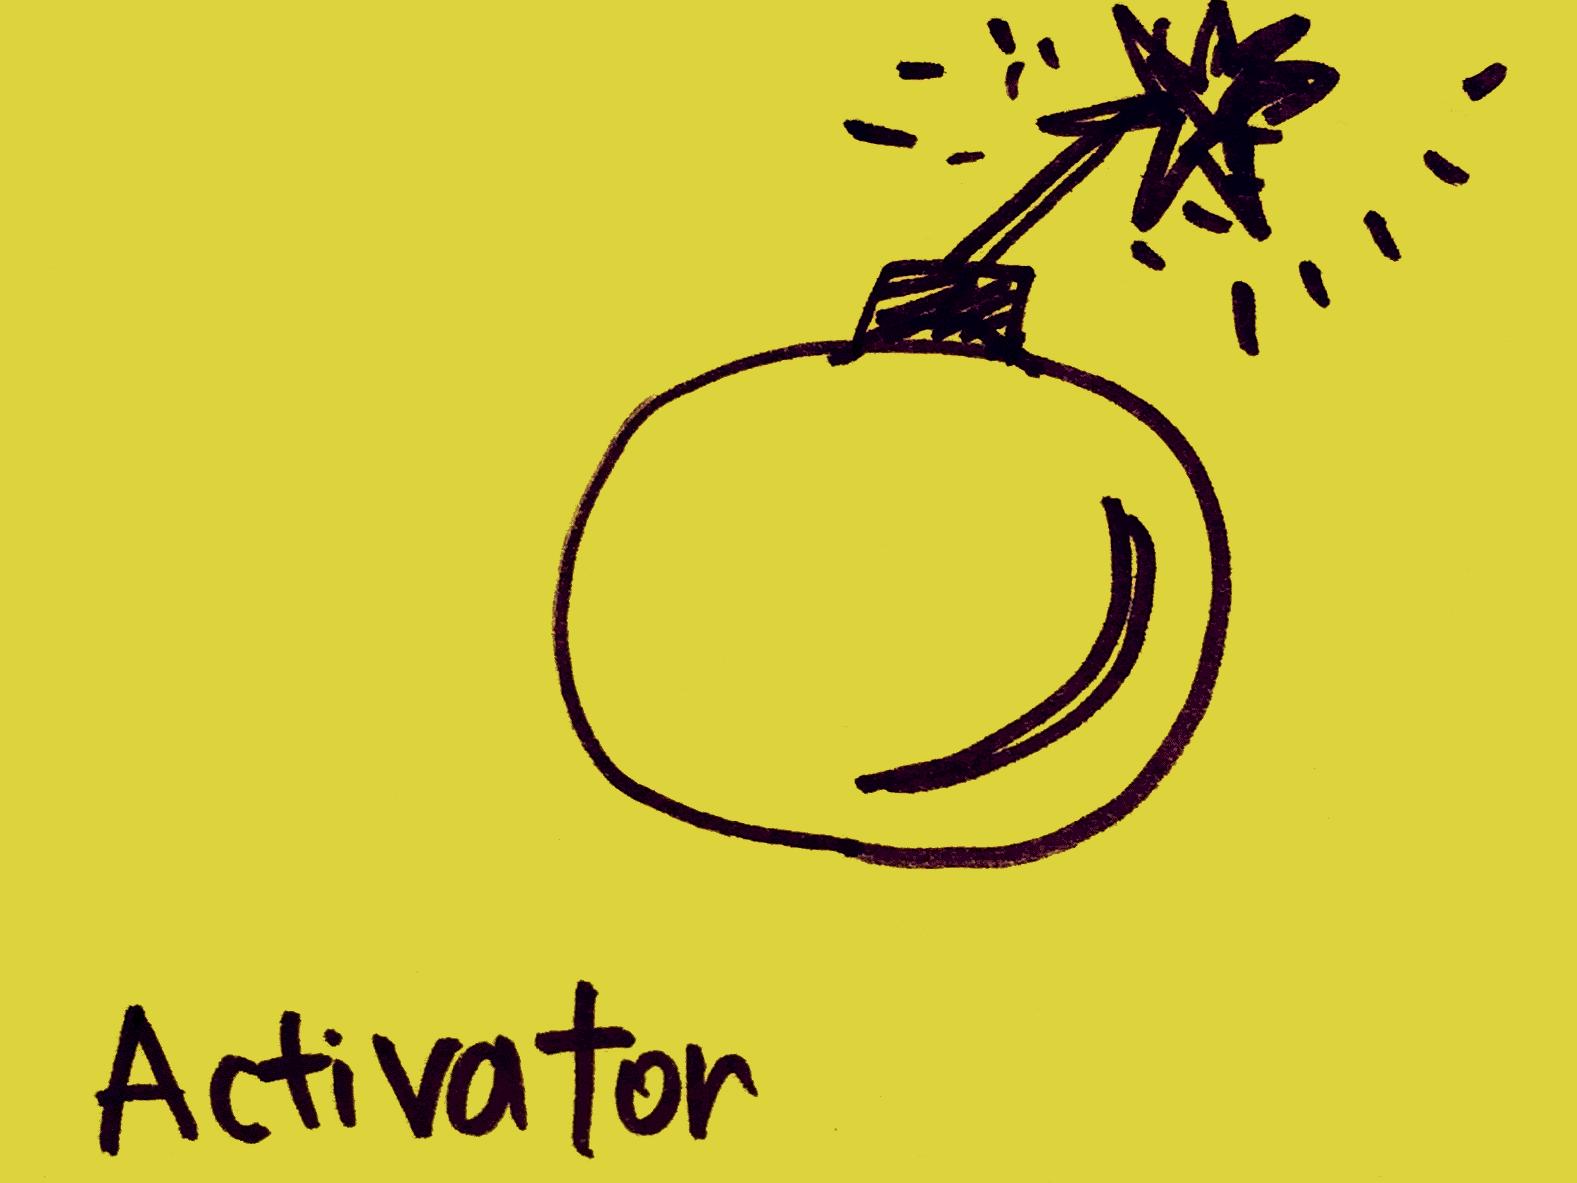 Activator Strengthsfinder Bomb Ticking